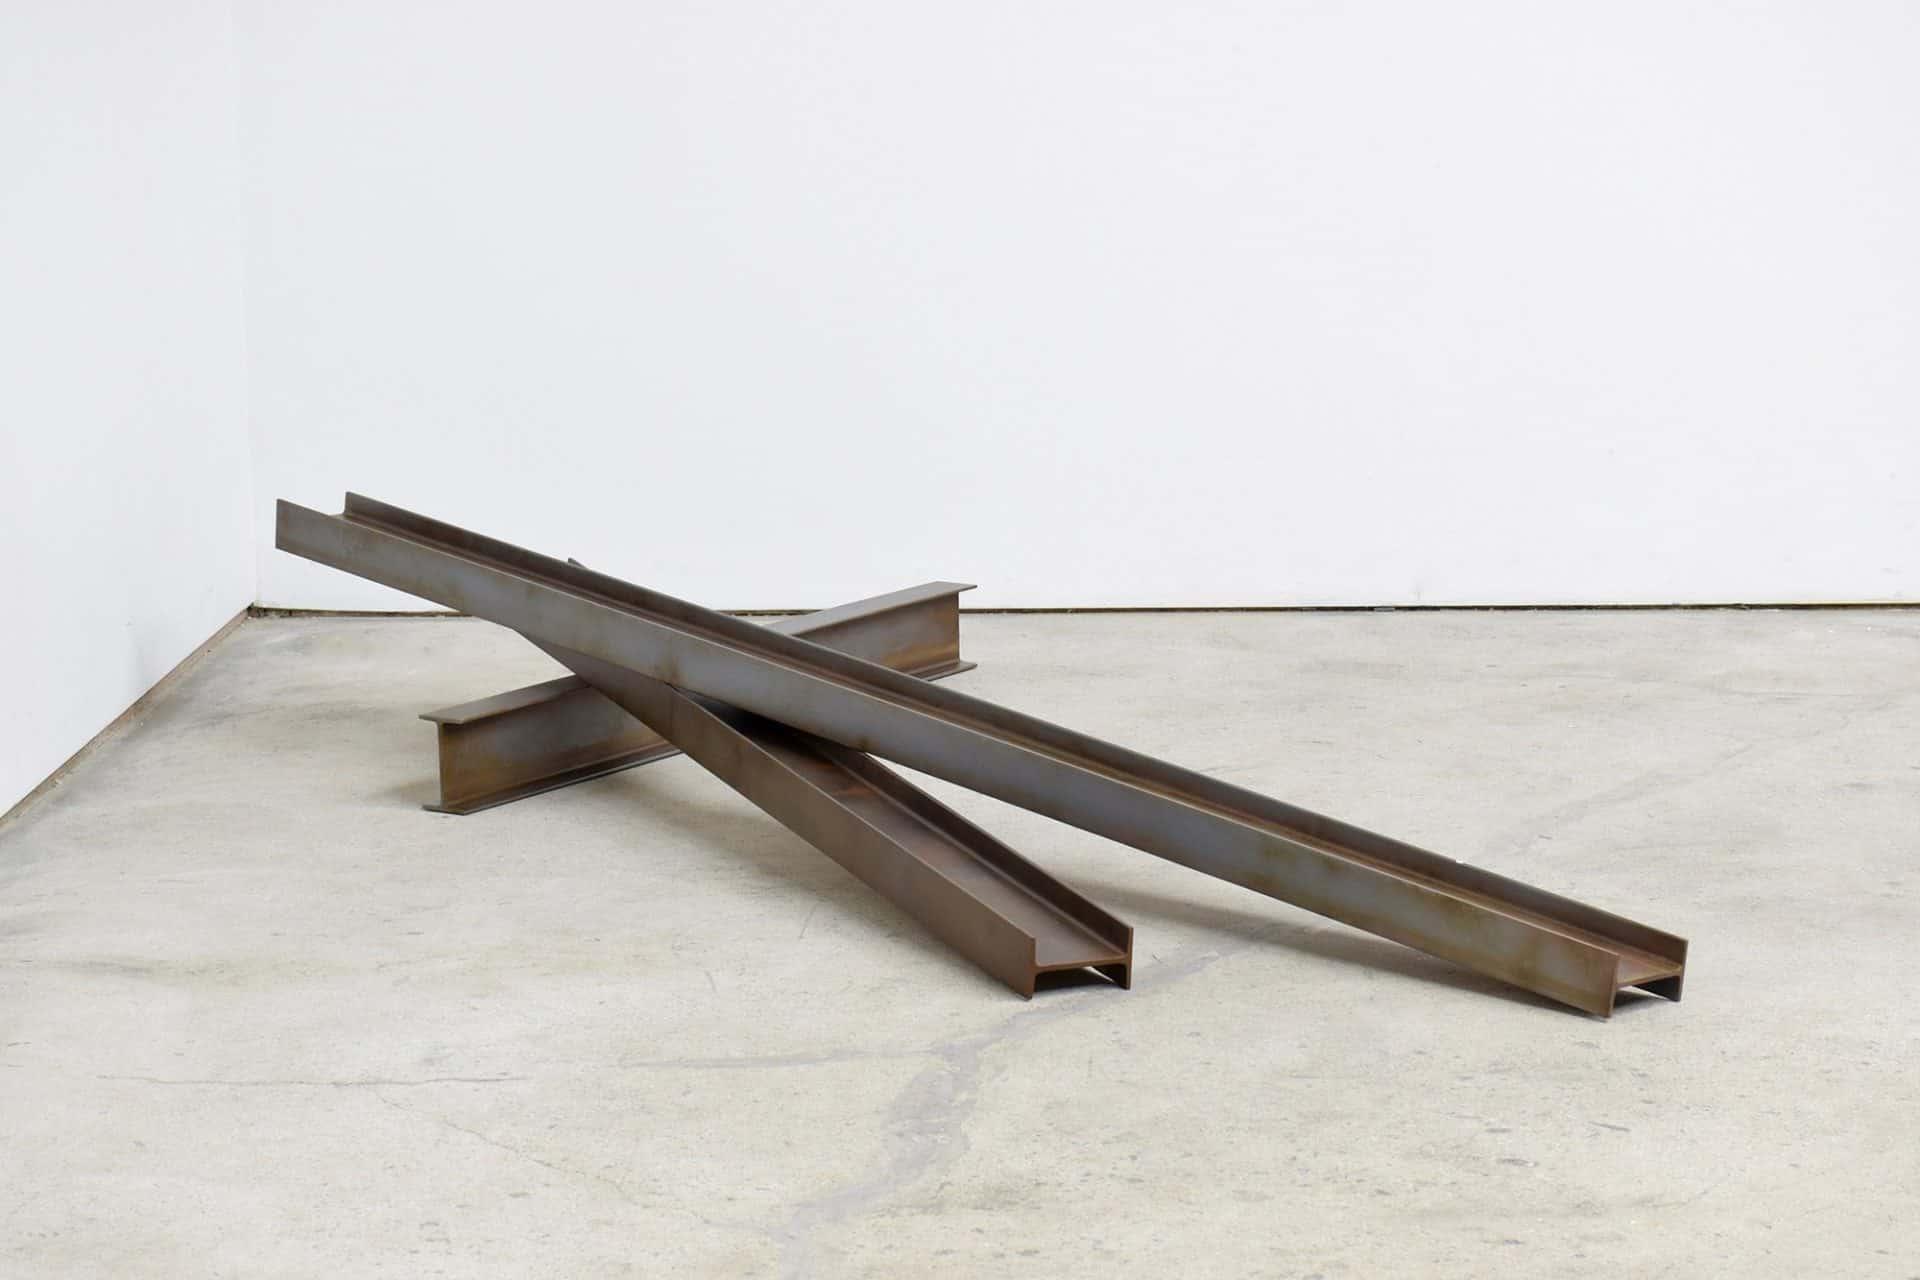 Oshiro Kaz 2016 Three steel beams